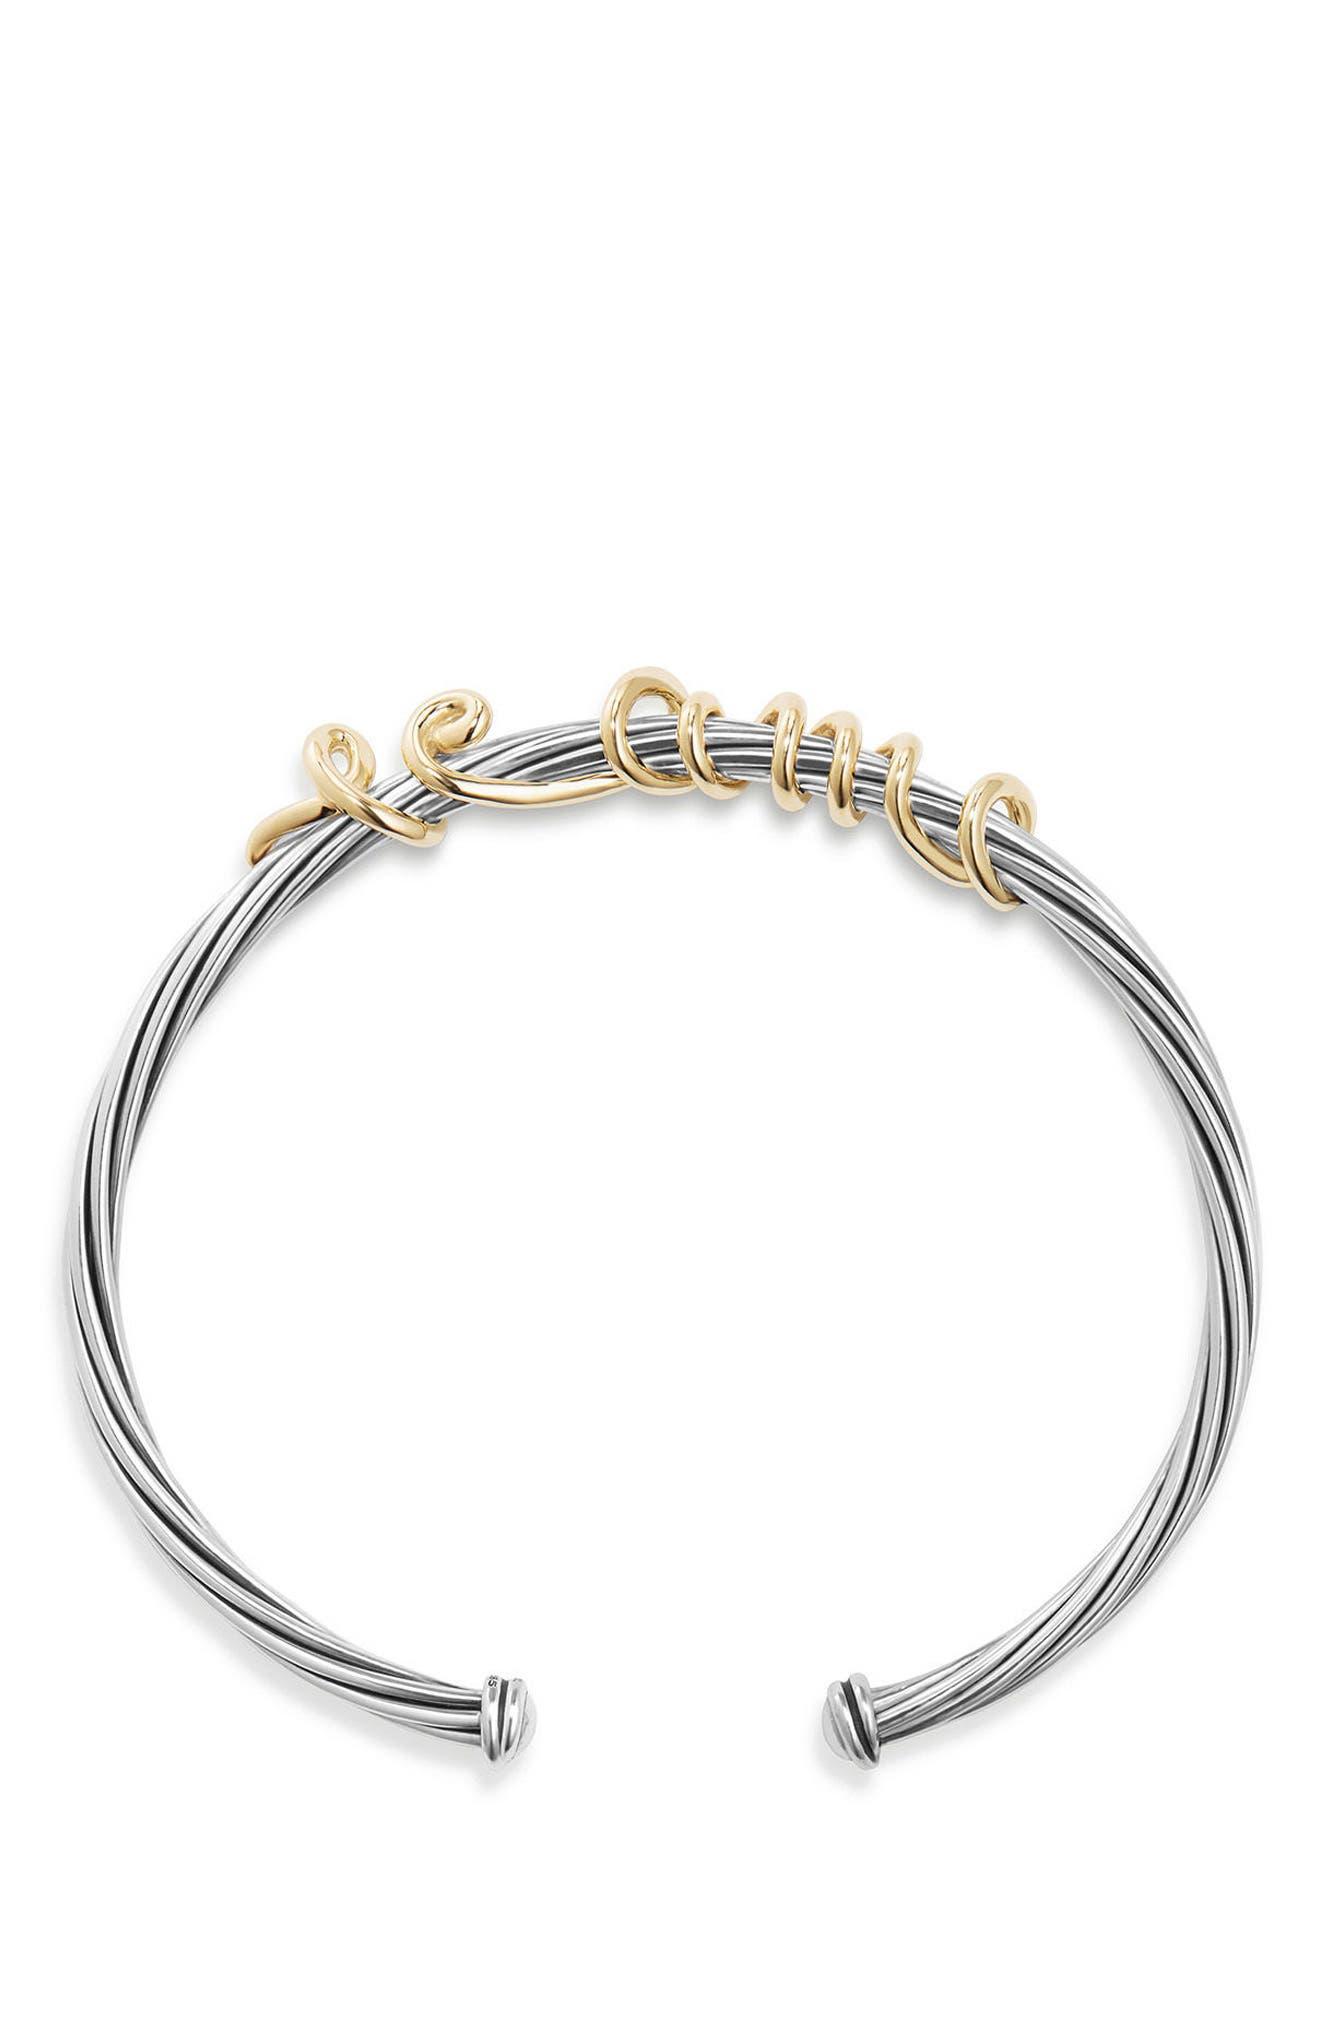 Whispers Te Amo Bracelet,                             Alternate thumbnail 2, color,                             SILVER/ GOLD